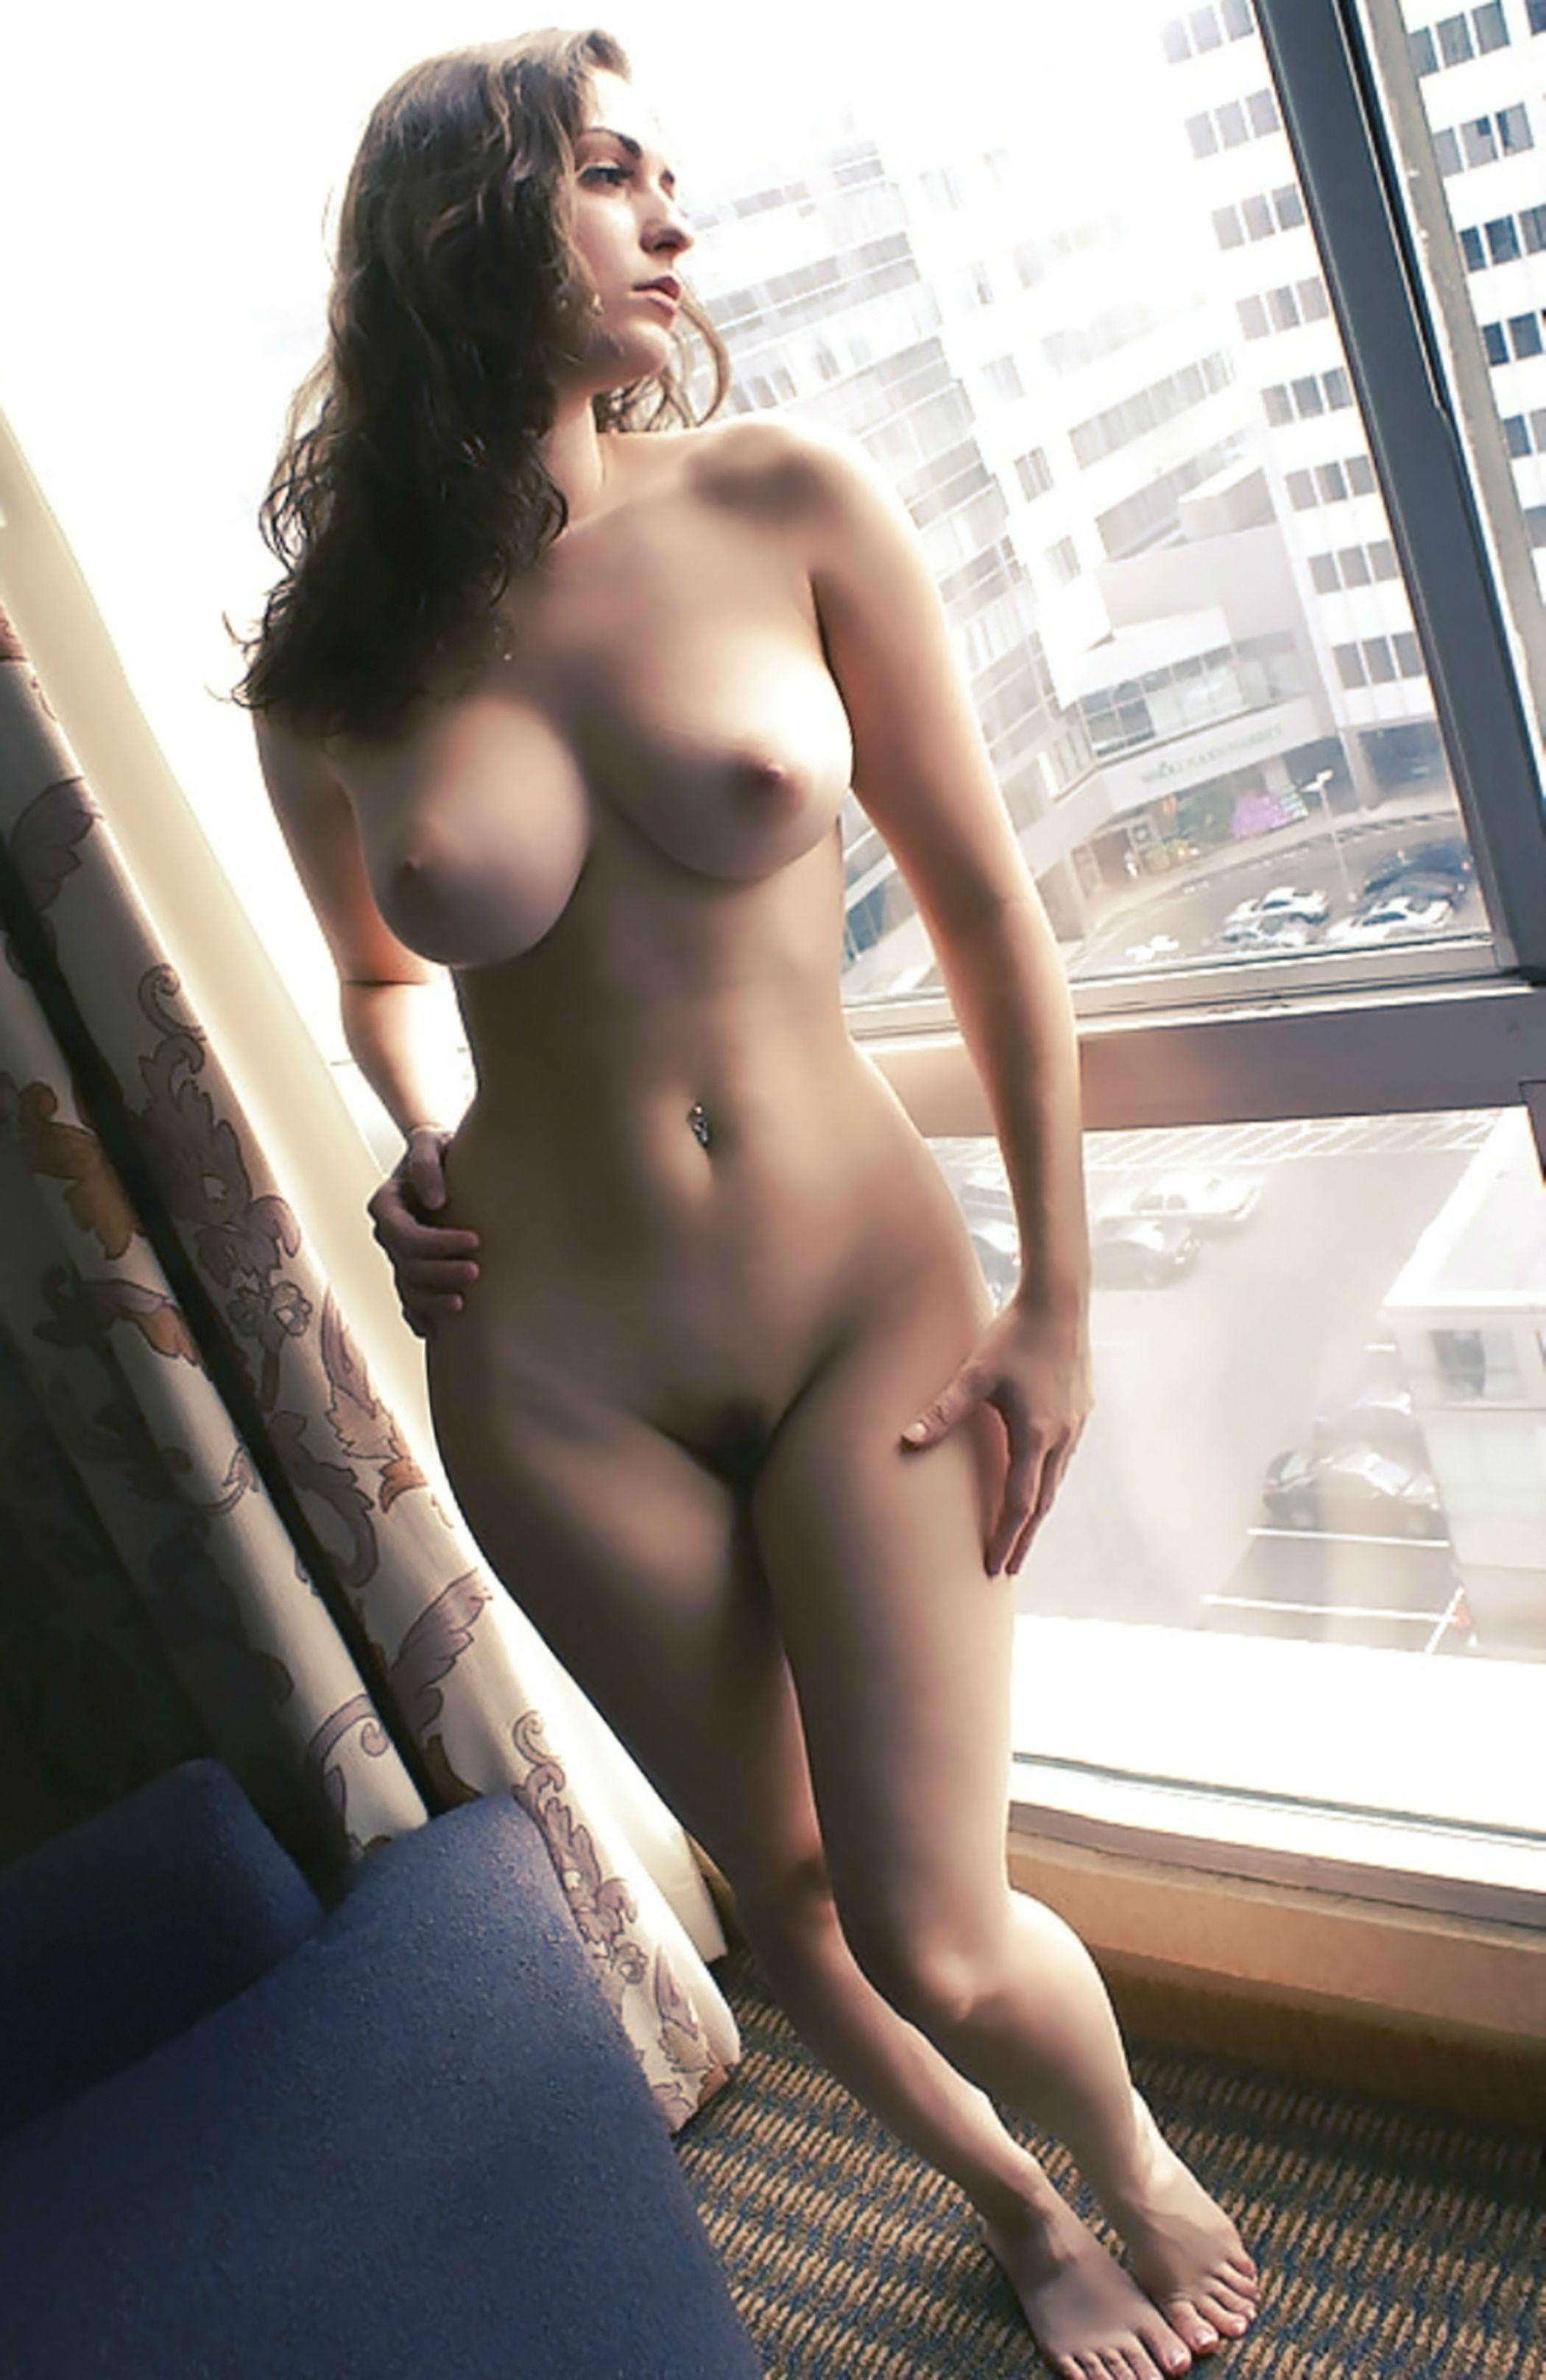 beutifull girls pussy nude